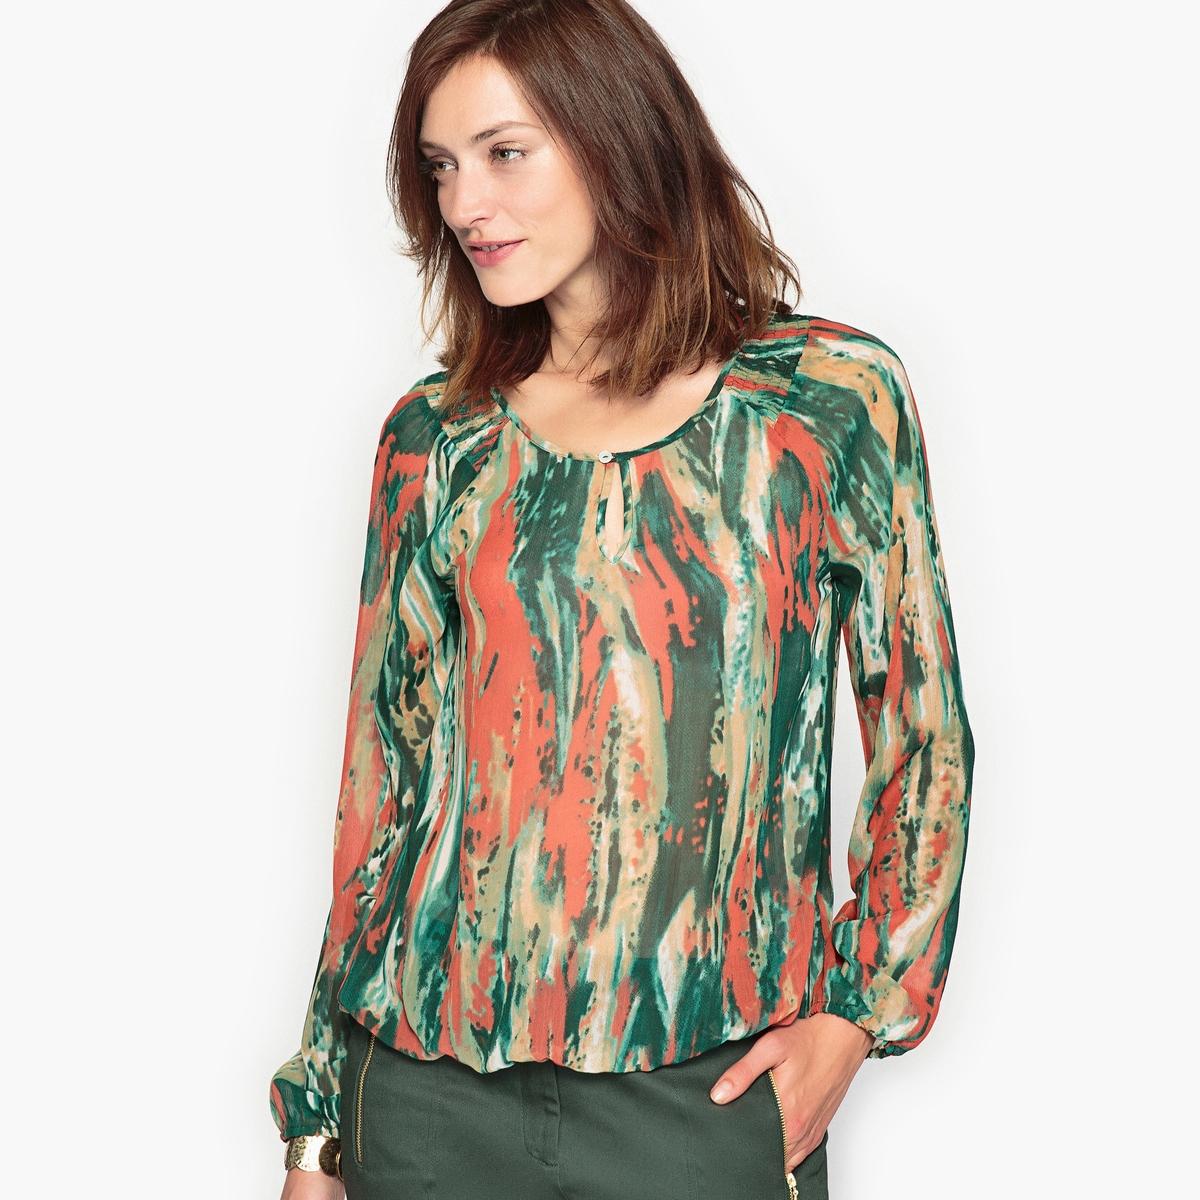 Блузка с рисунком, из жатого крепа футболка с рисунком из жатого джерси